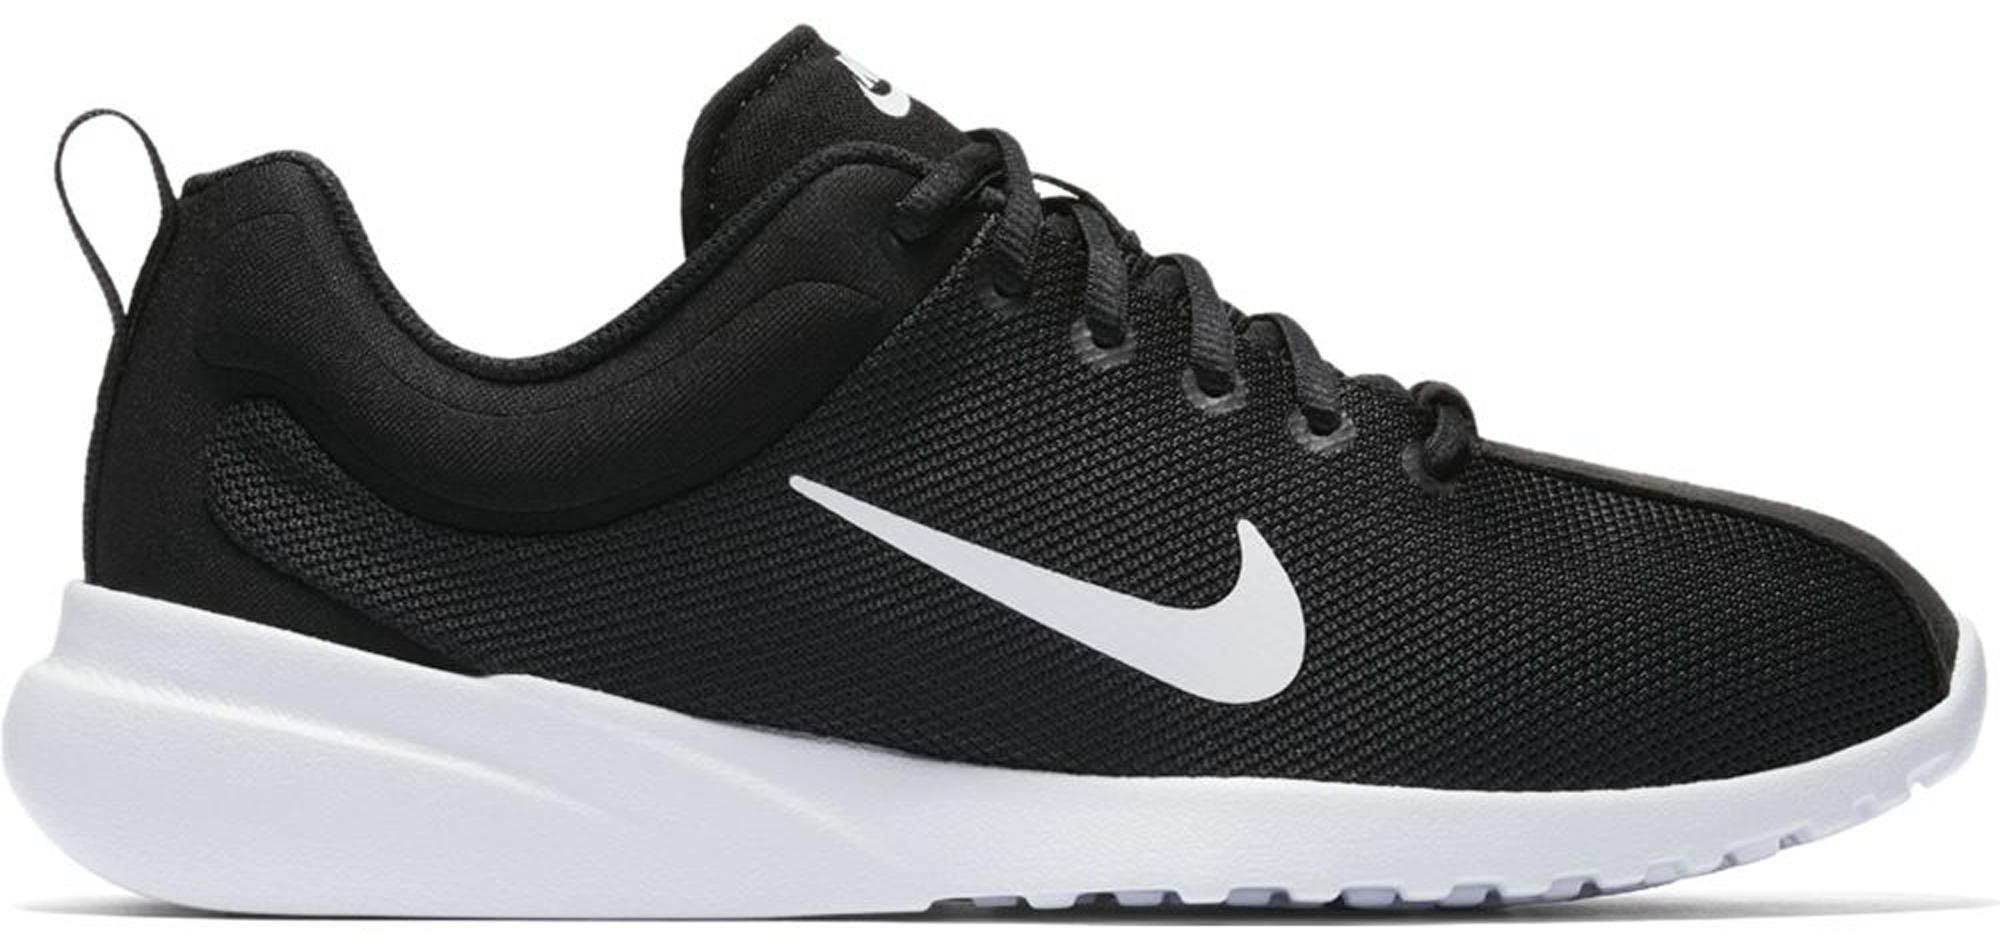 Nike Superflyte Black White (W